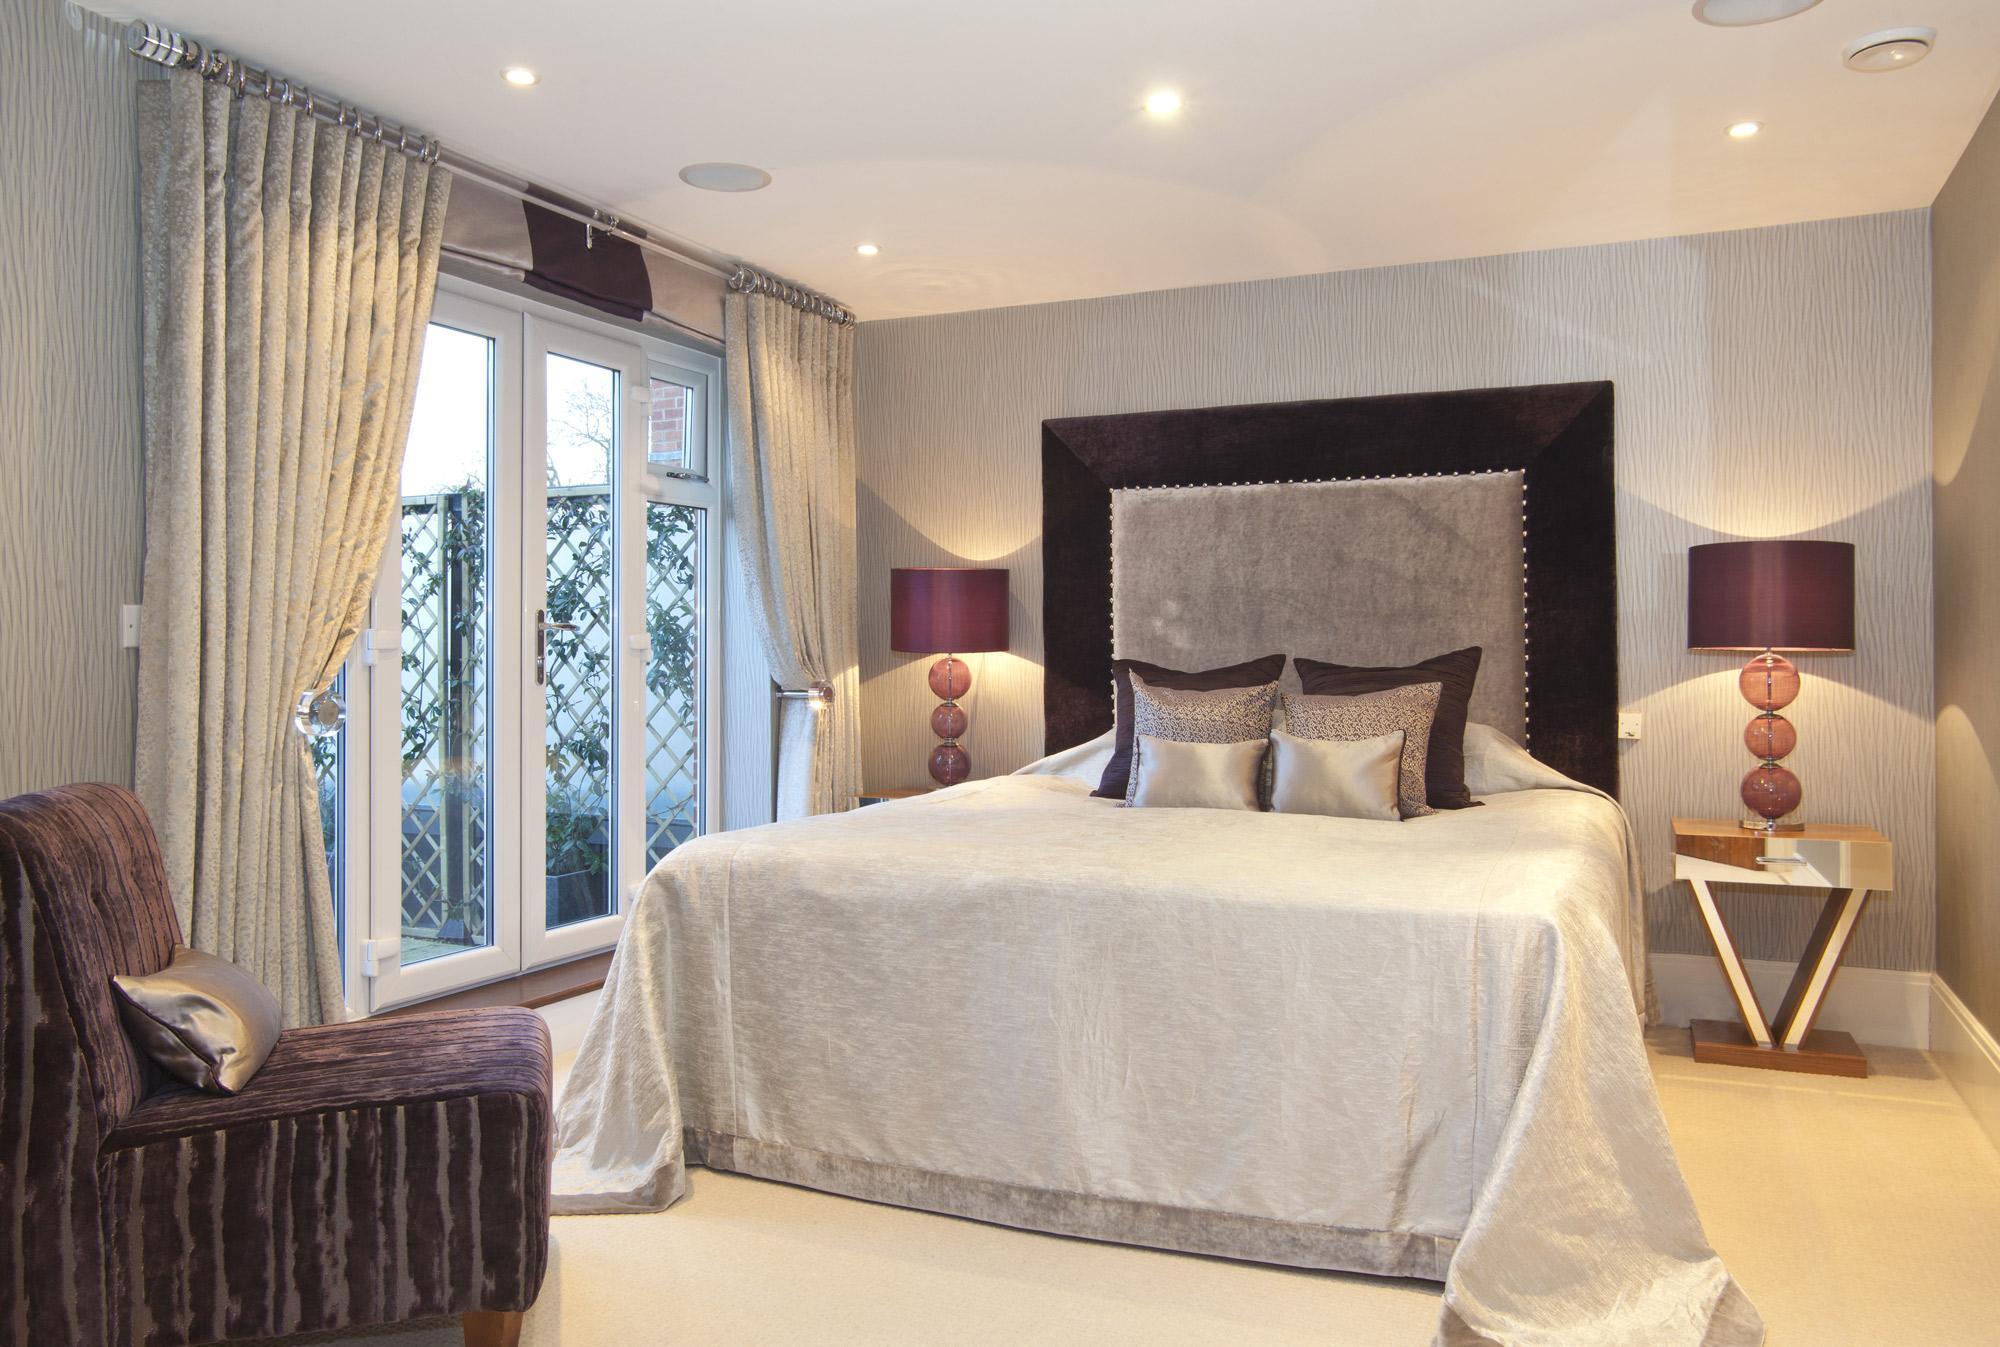 Flair Range Mirrored Bedroom Furniture